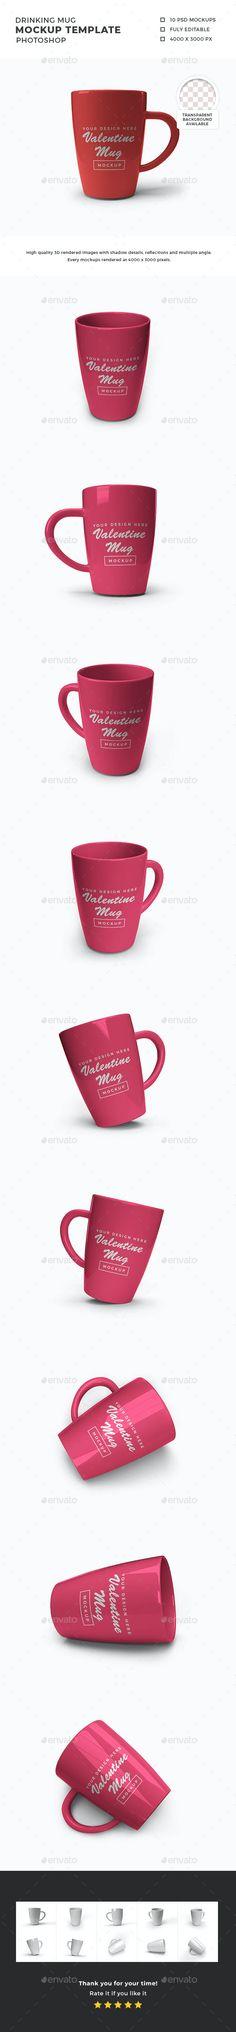 Drinking Mug Mockup Template by DendySign | GraphicRiver